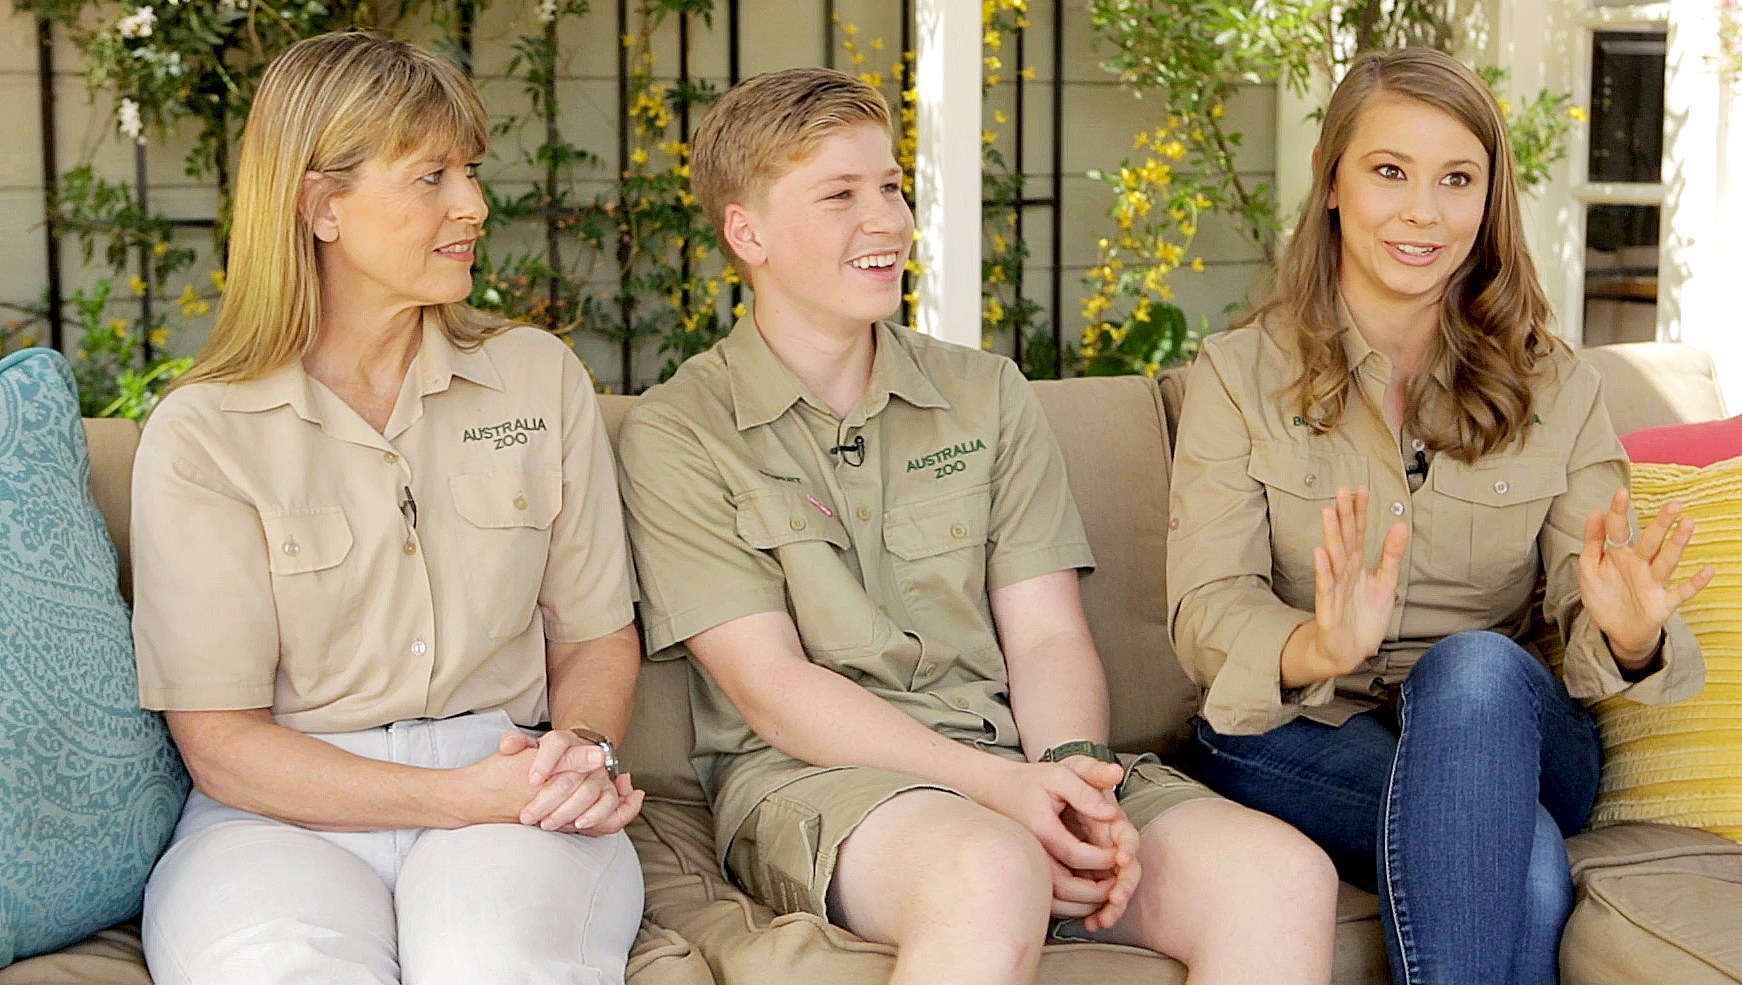 Terri, Robert, and Bindi Irwin